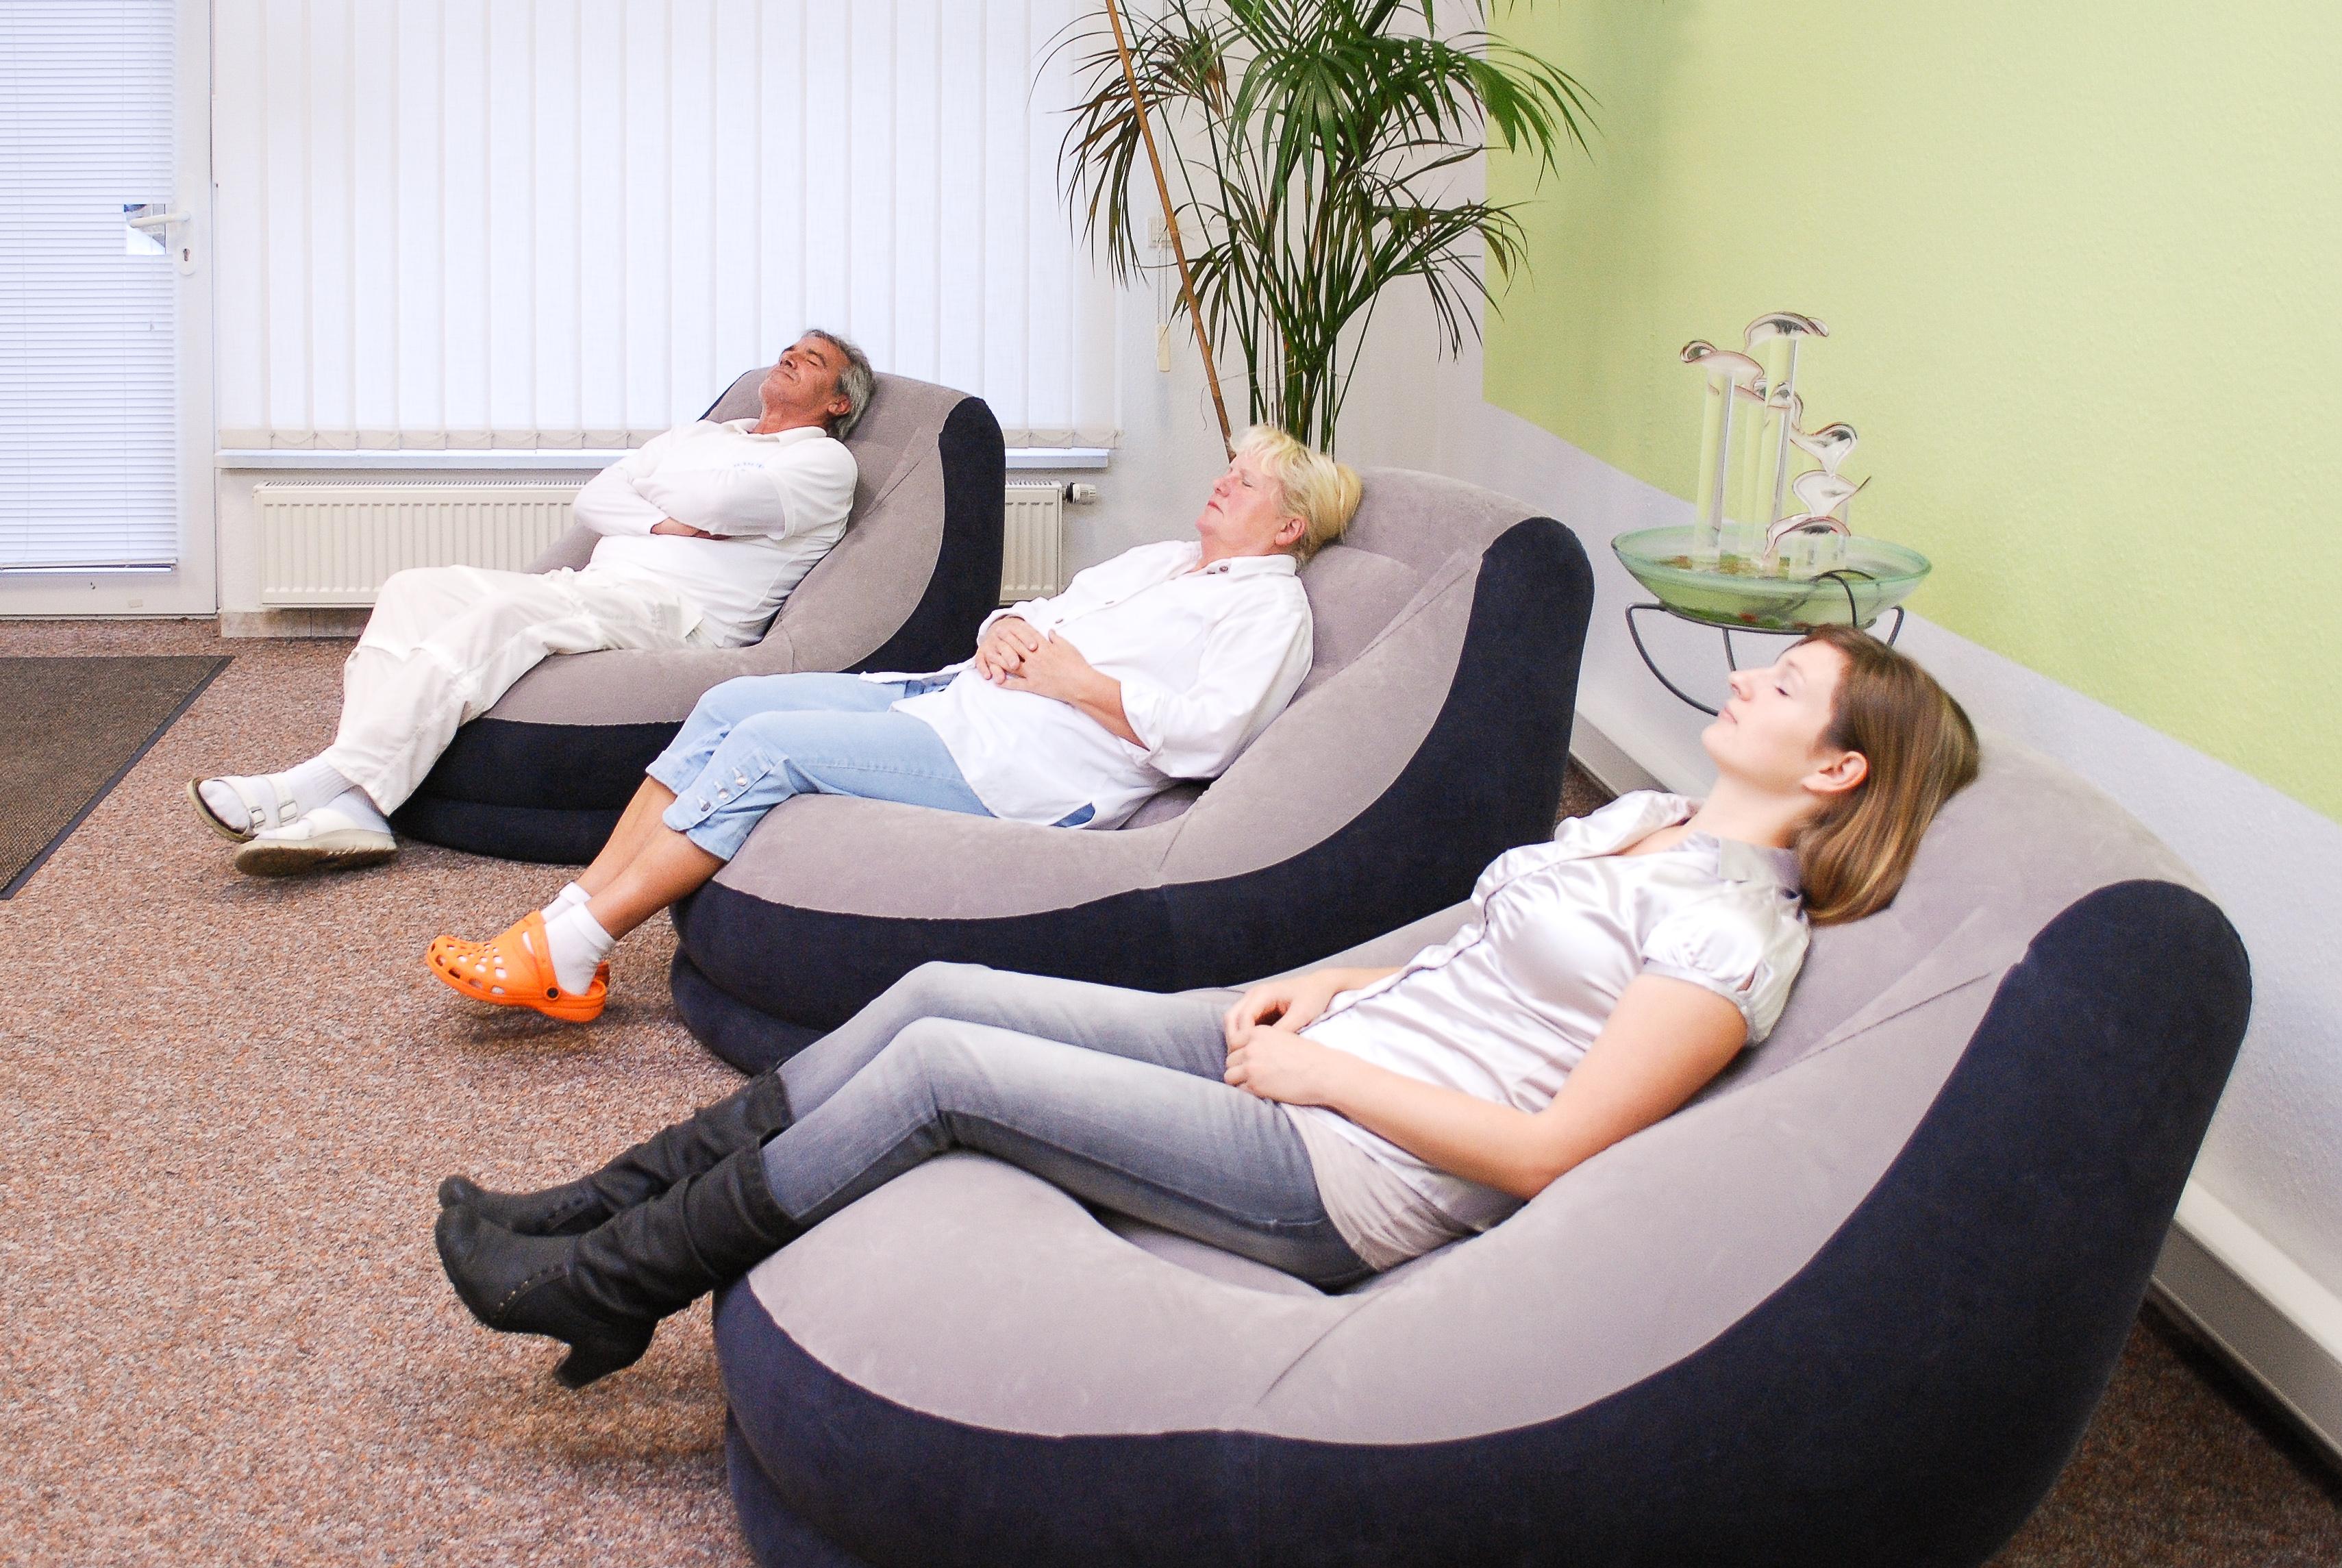 entspannungskurs magdeburg autogenes training